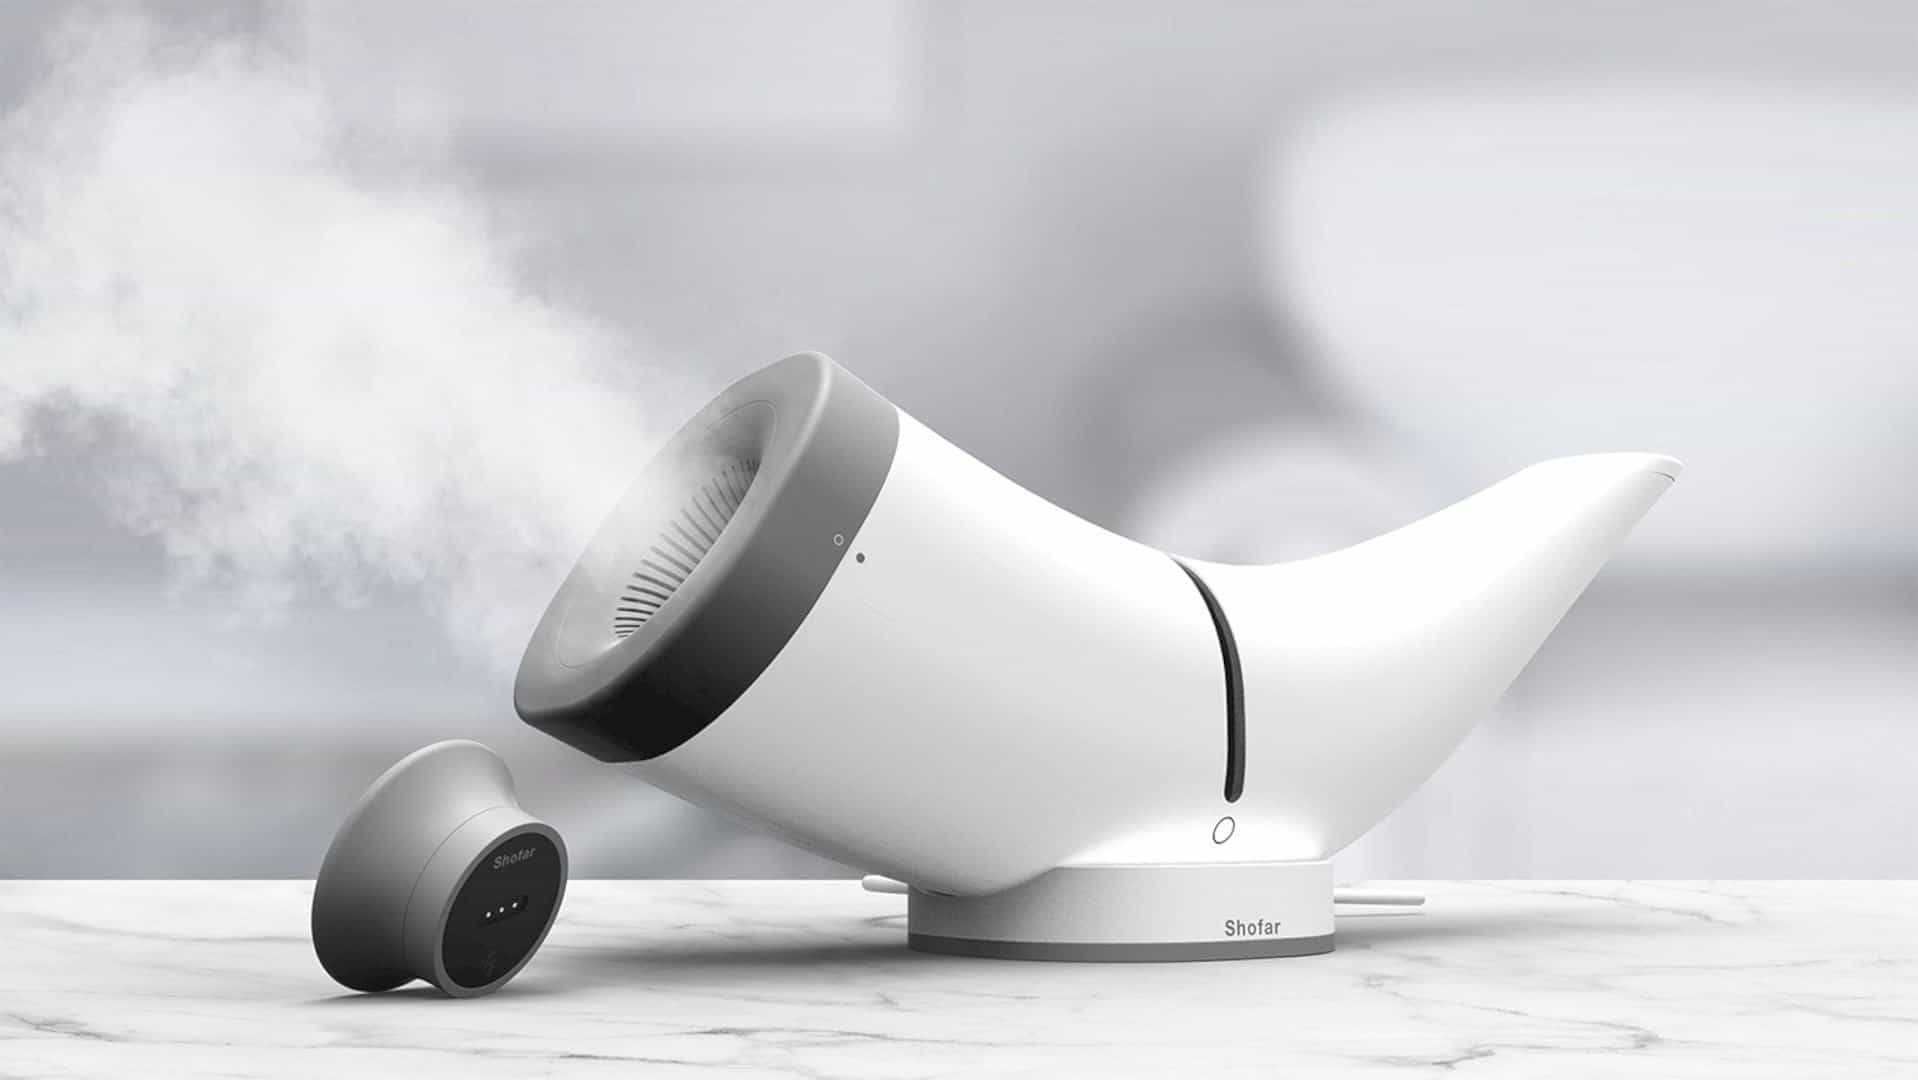 Shofar Humidifier 1